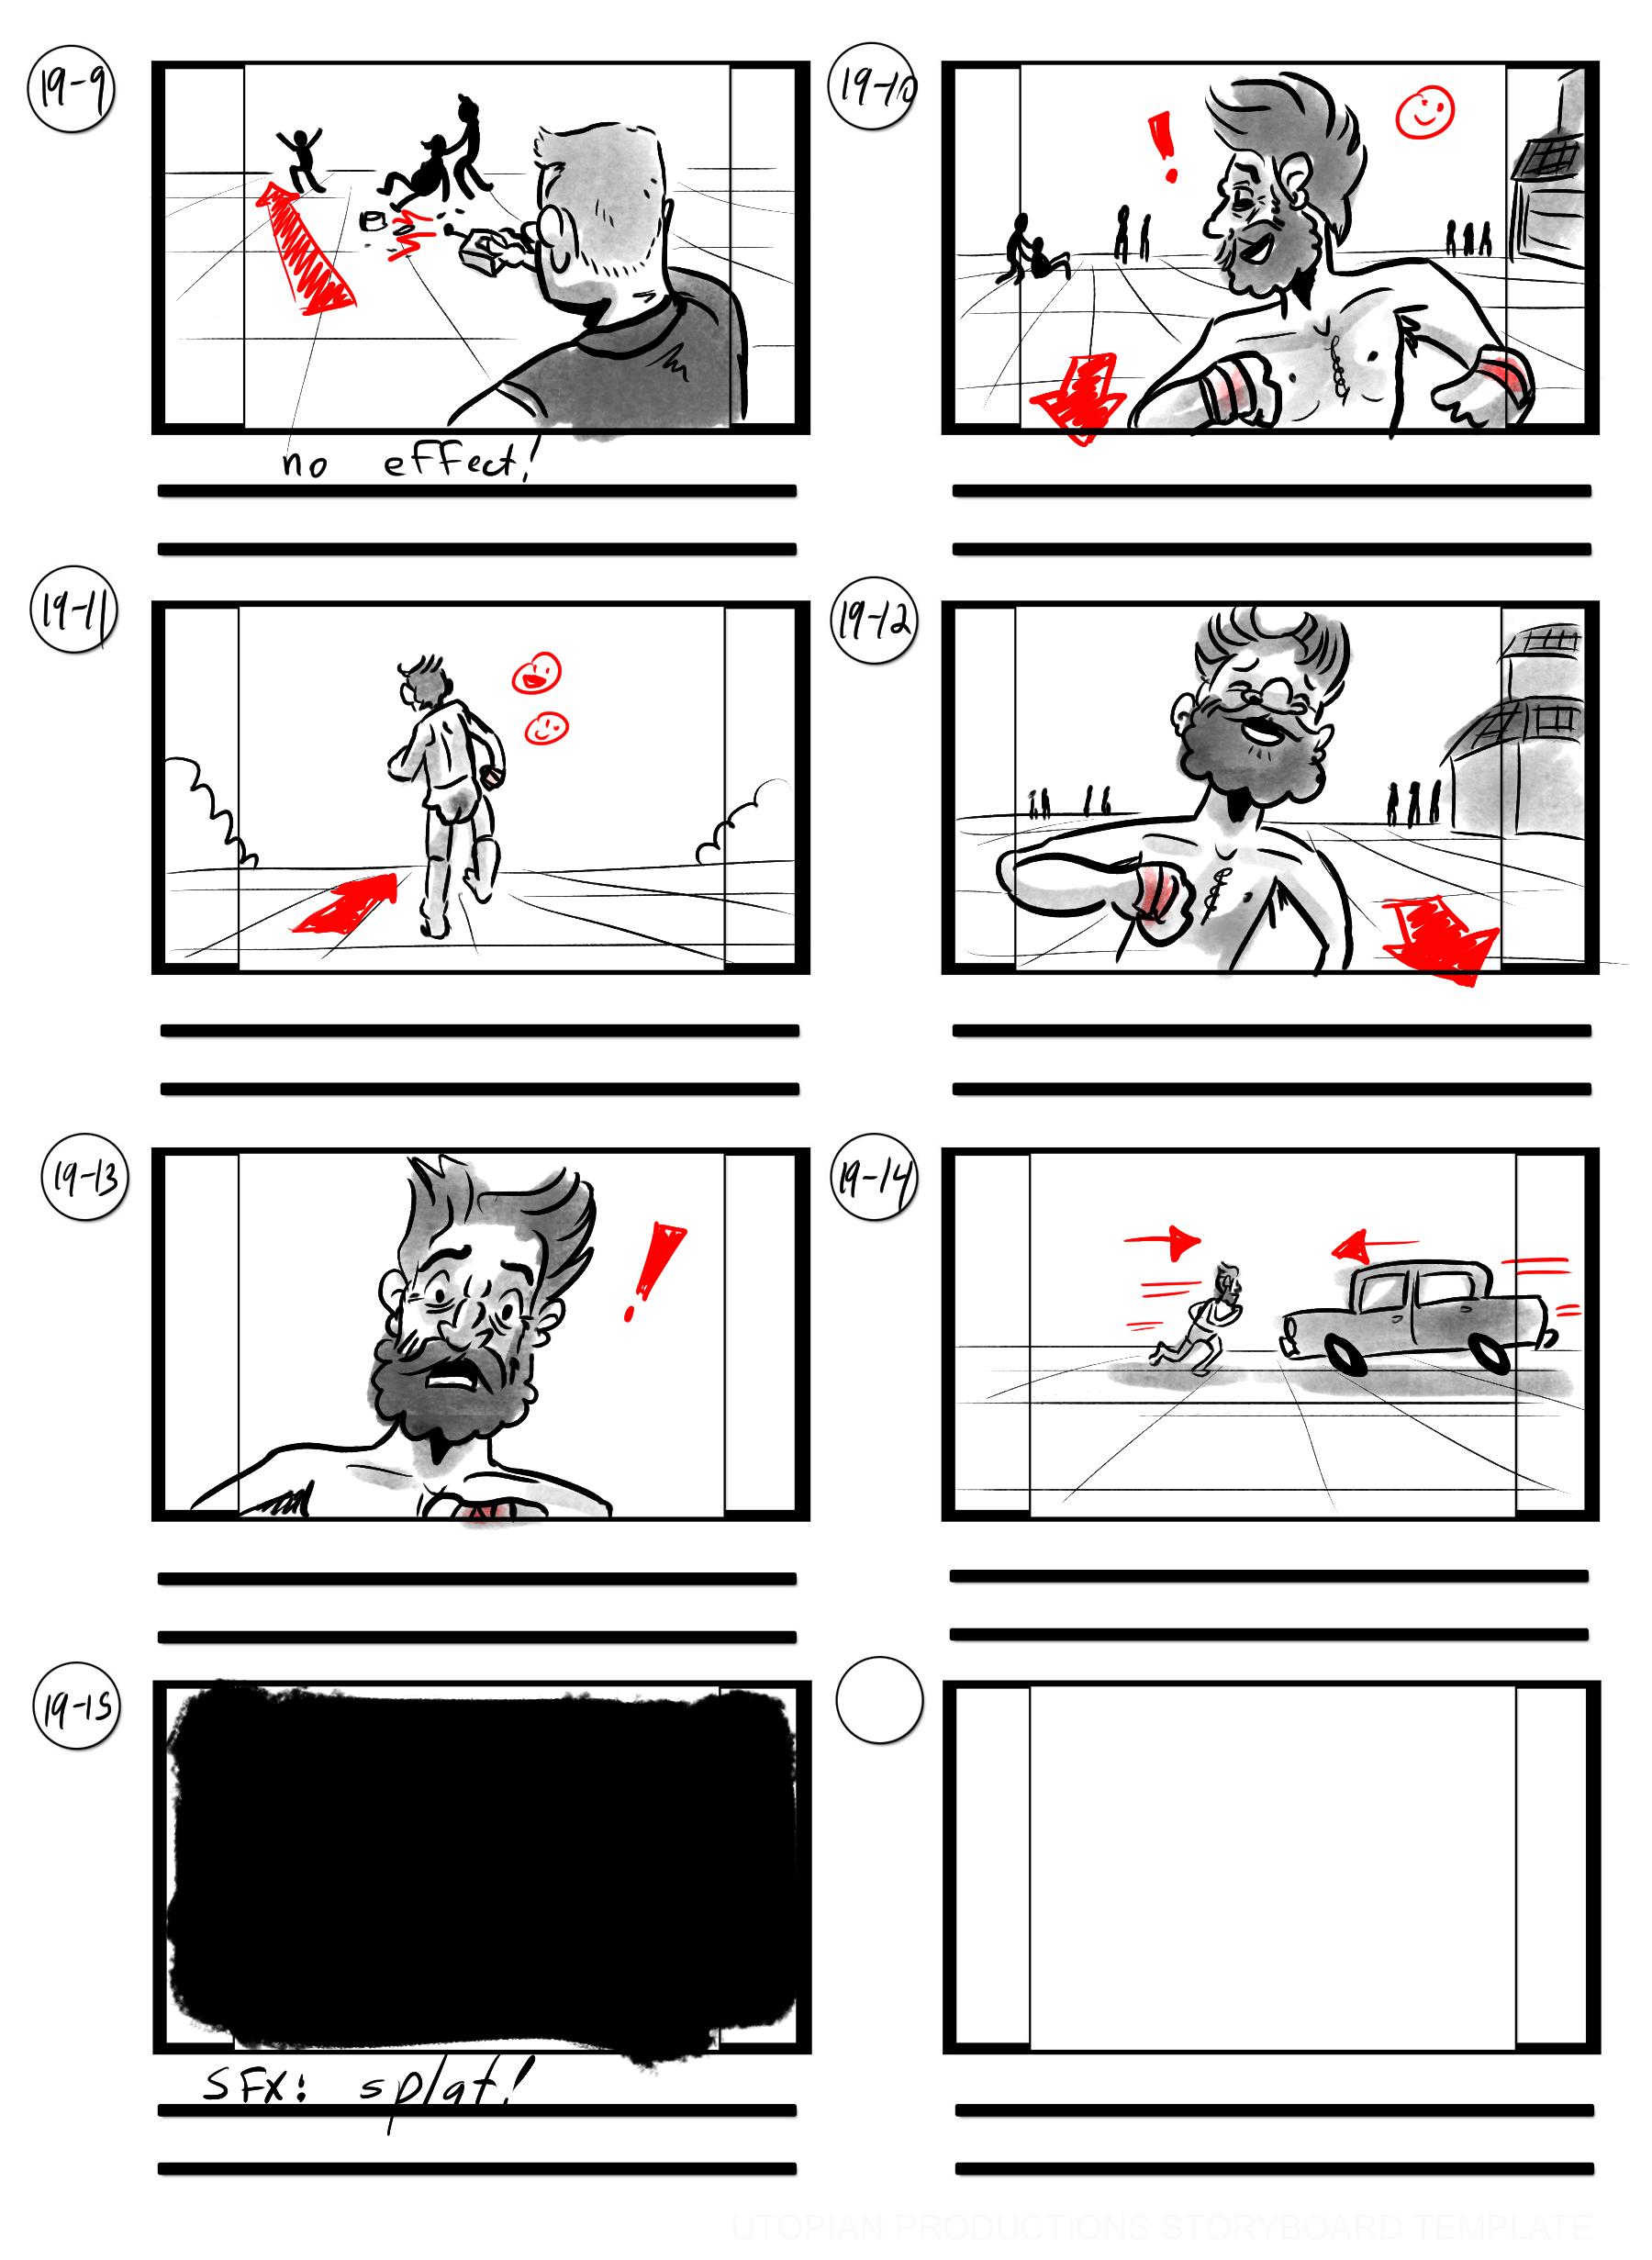 The Dog The Boy storyboard 19-2.jpg